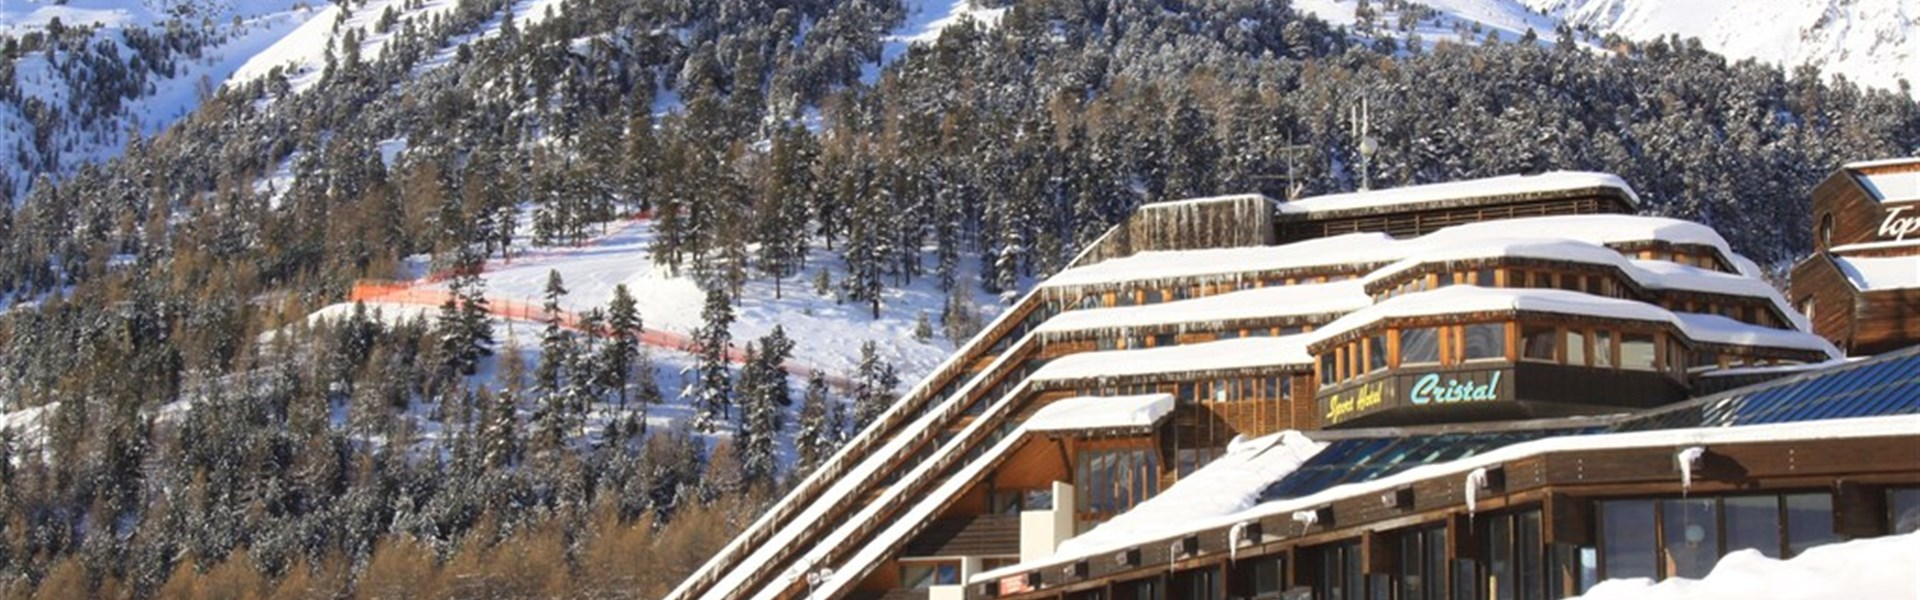 Blu Hotel Senales: Zirm-Cristal -